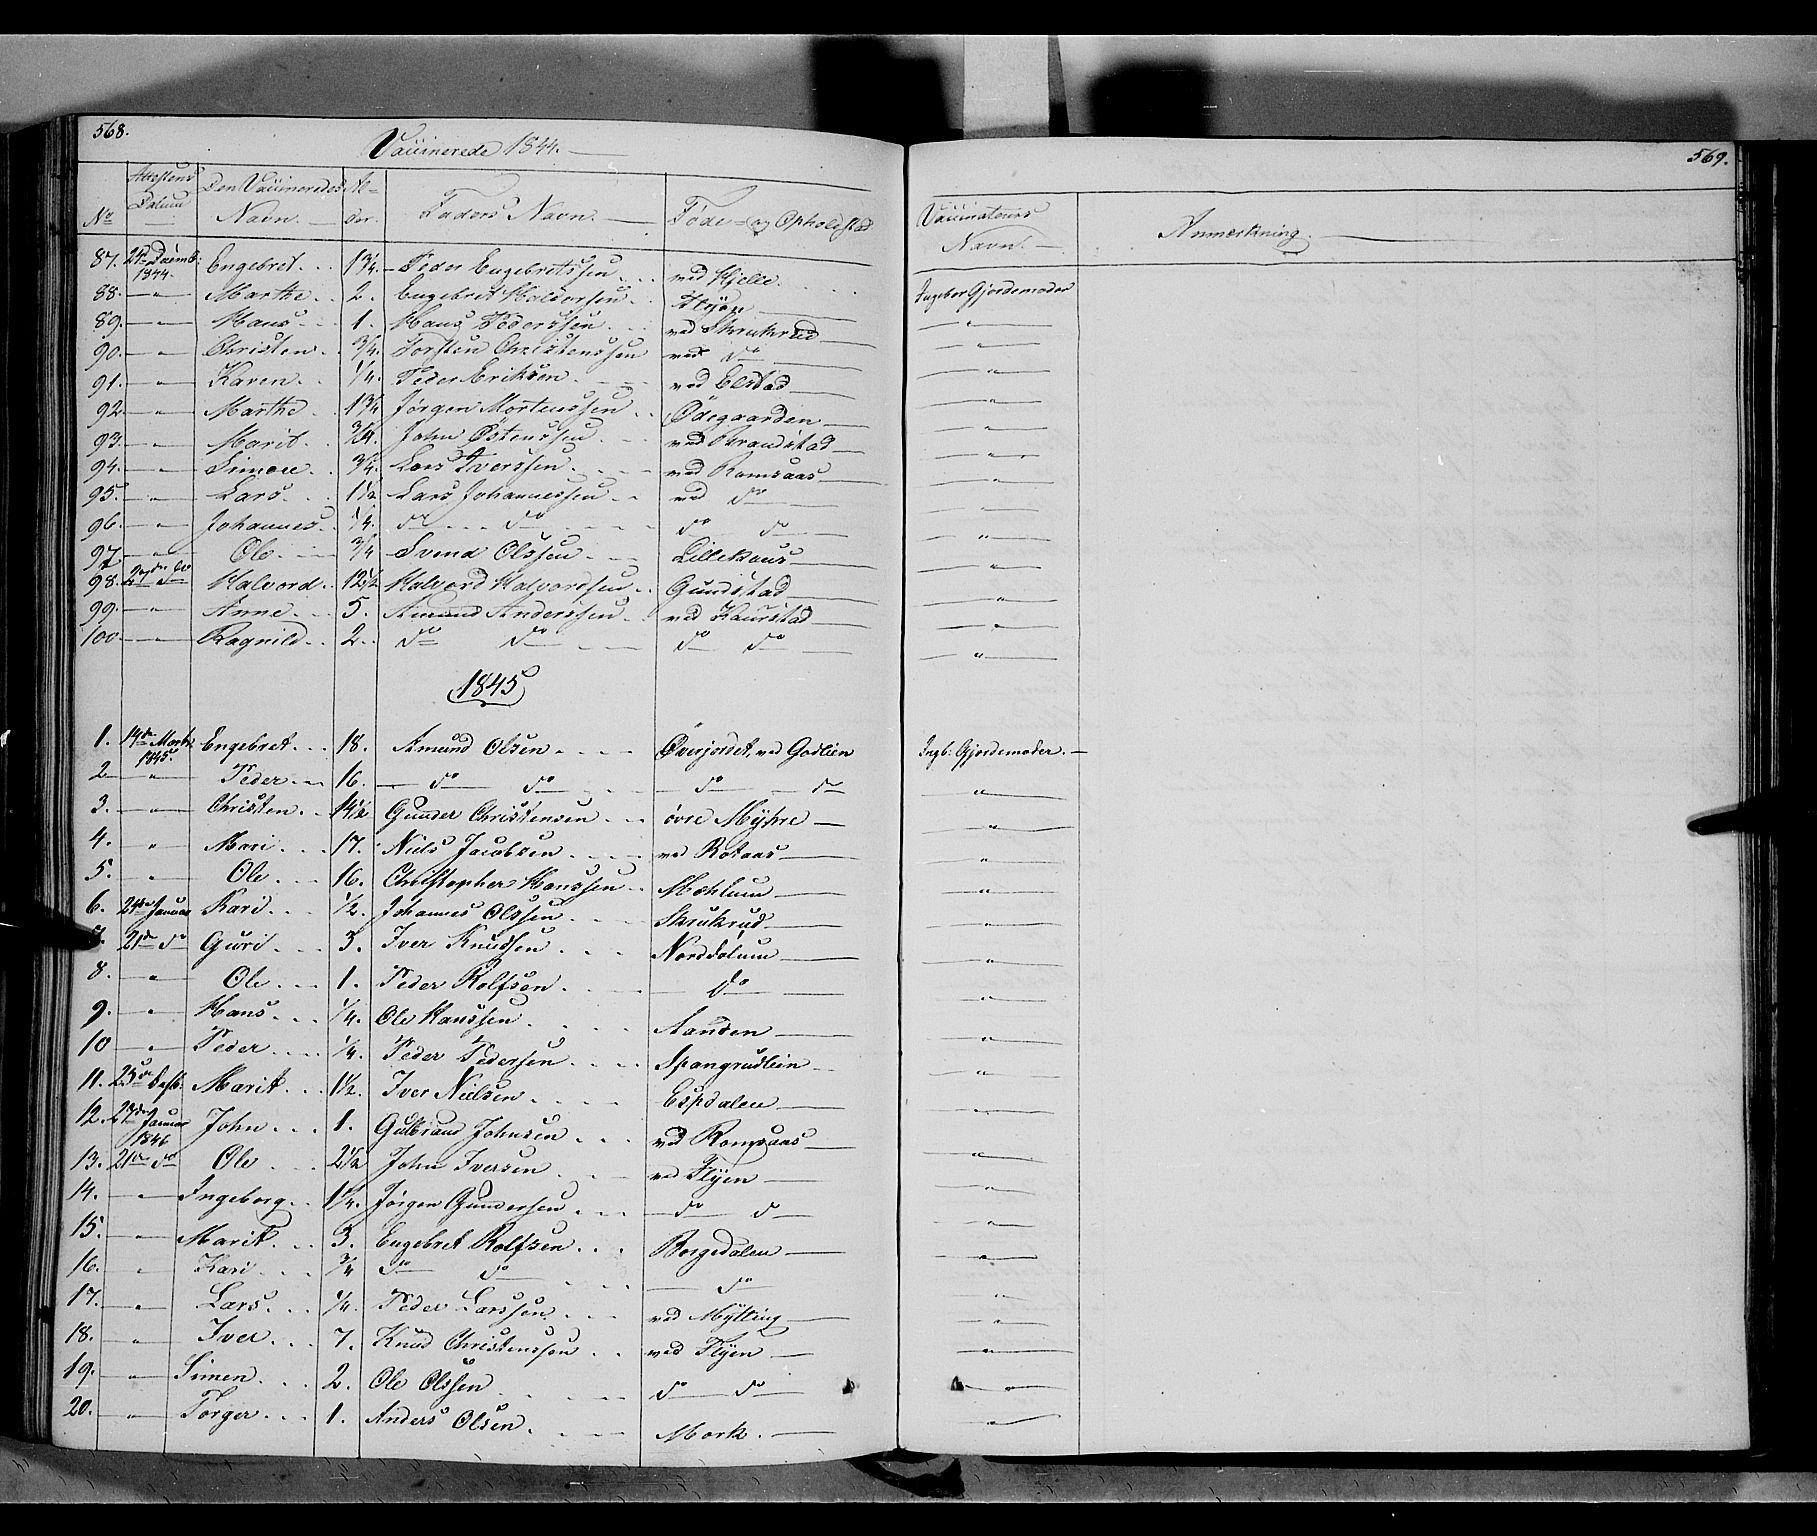 SAH, Ringebu prestekontor, Ministerialbok nr. 5, 1839-1848, s. 568-569